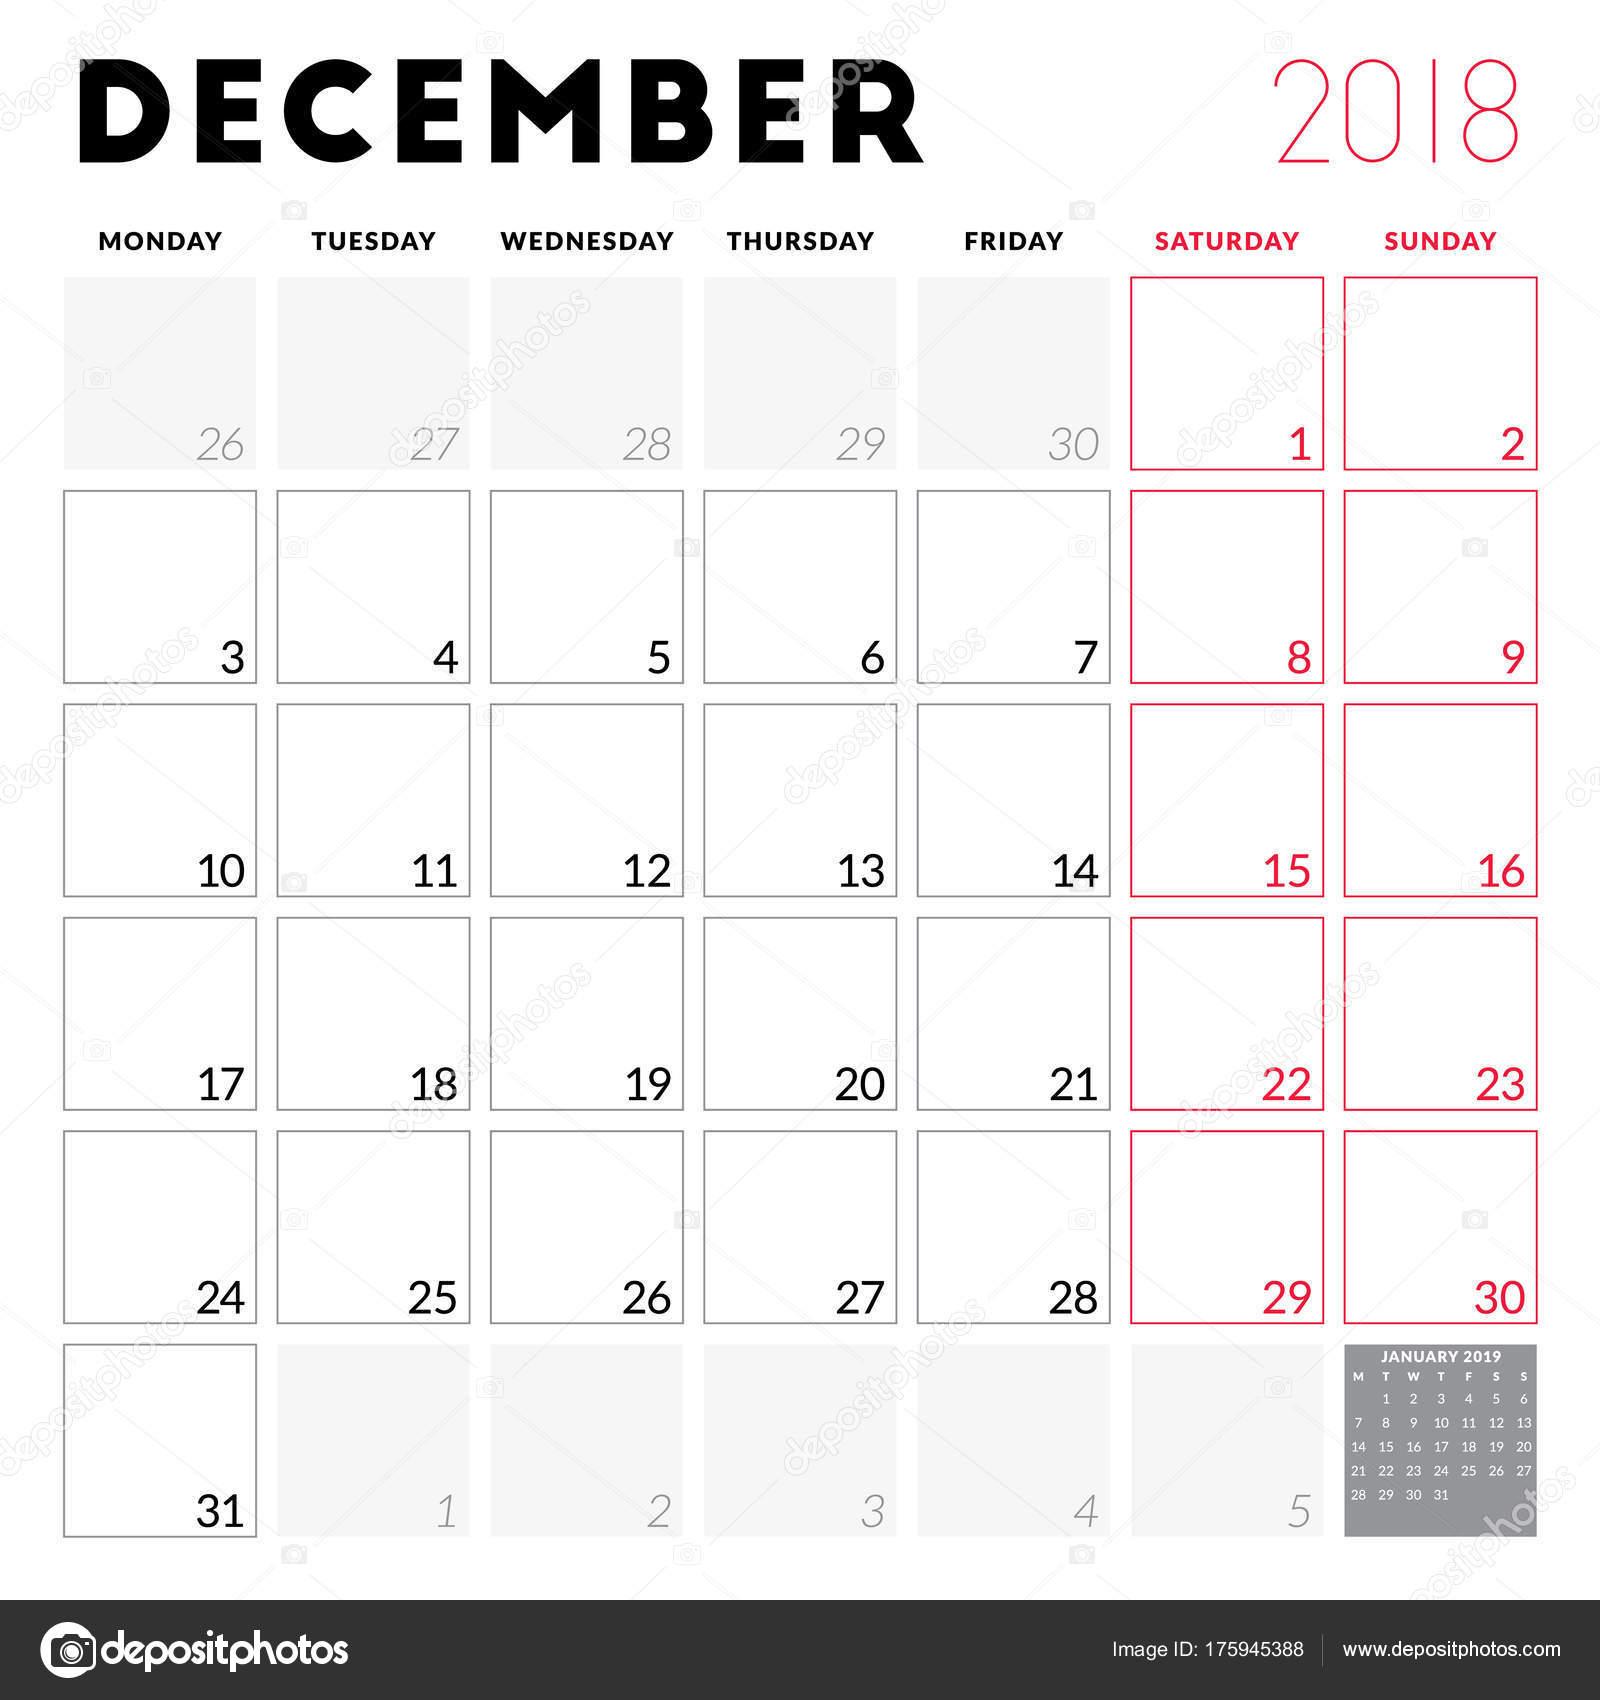 calendar planner for december 2018 week starts on monday printable